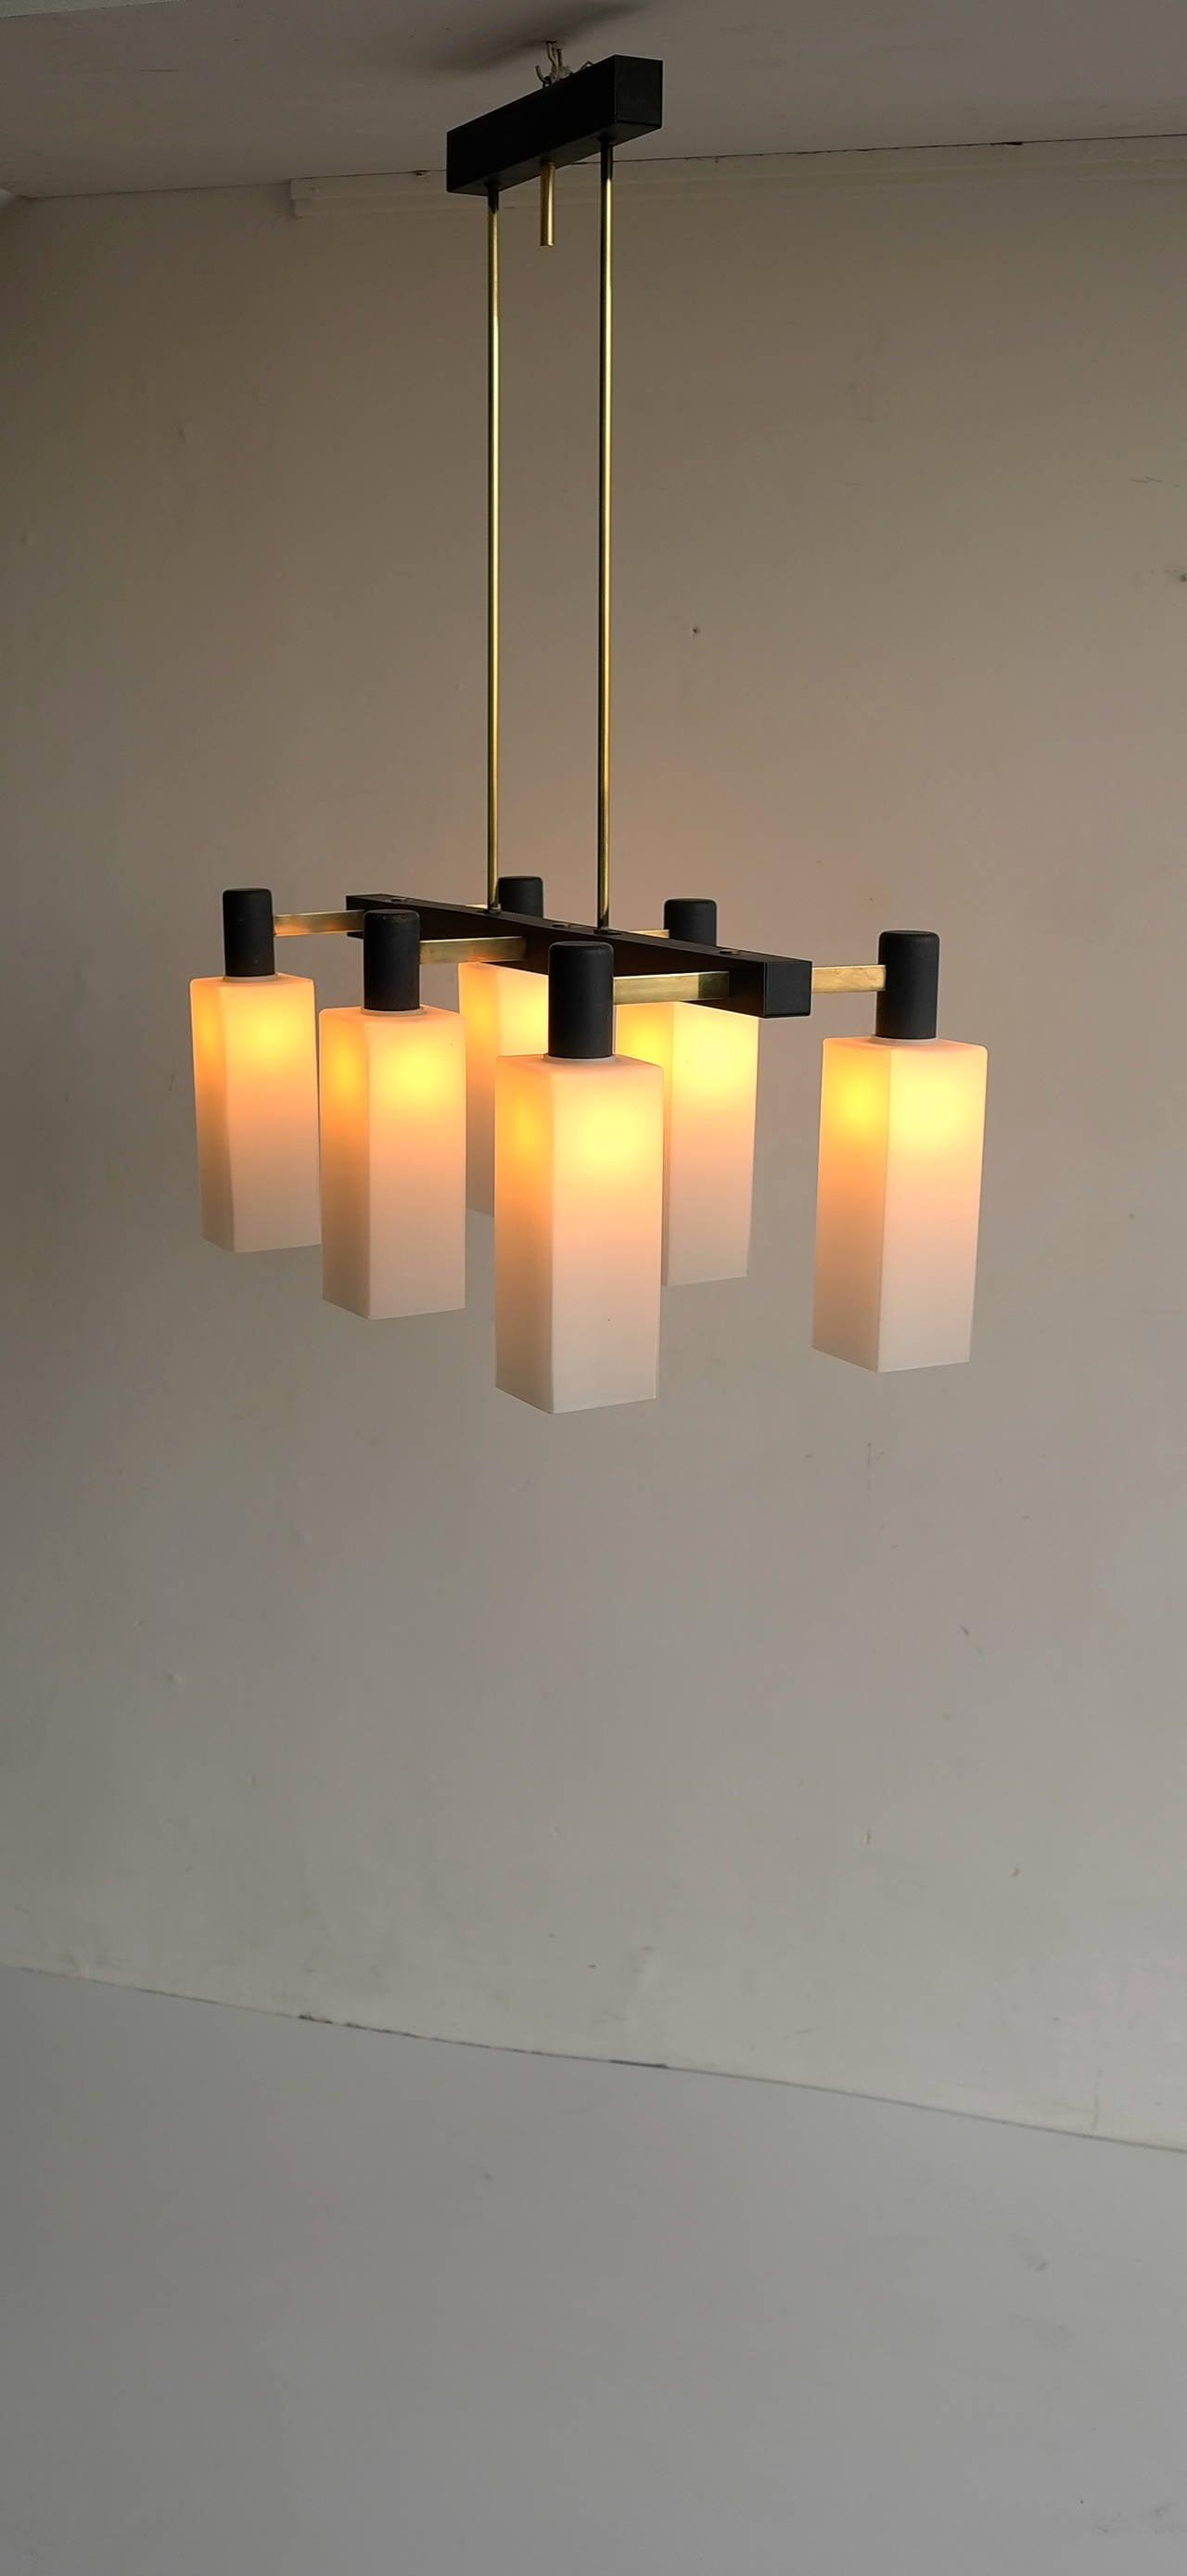 Italian Monumental Pendant Lamp, 1960s For Sale 2